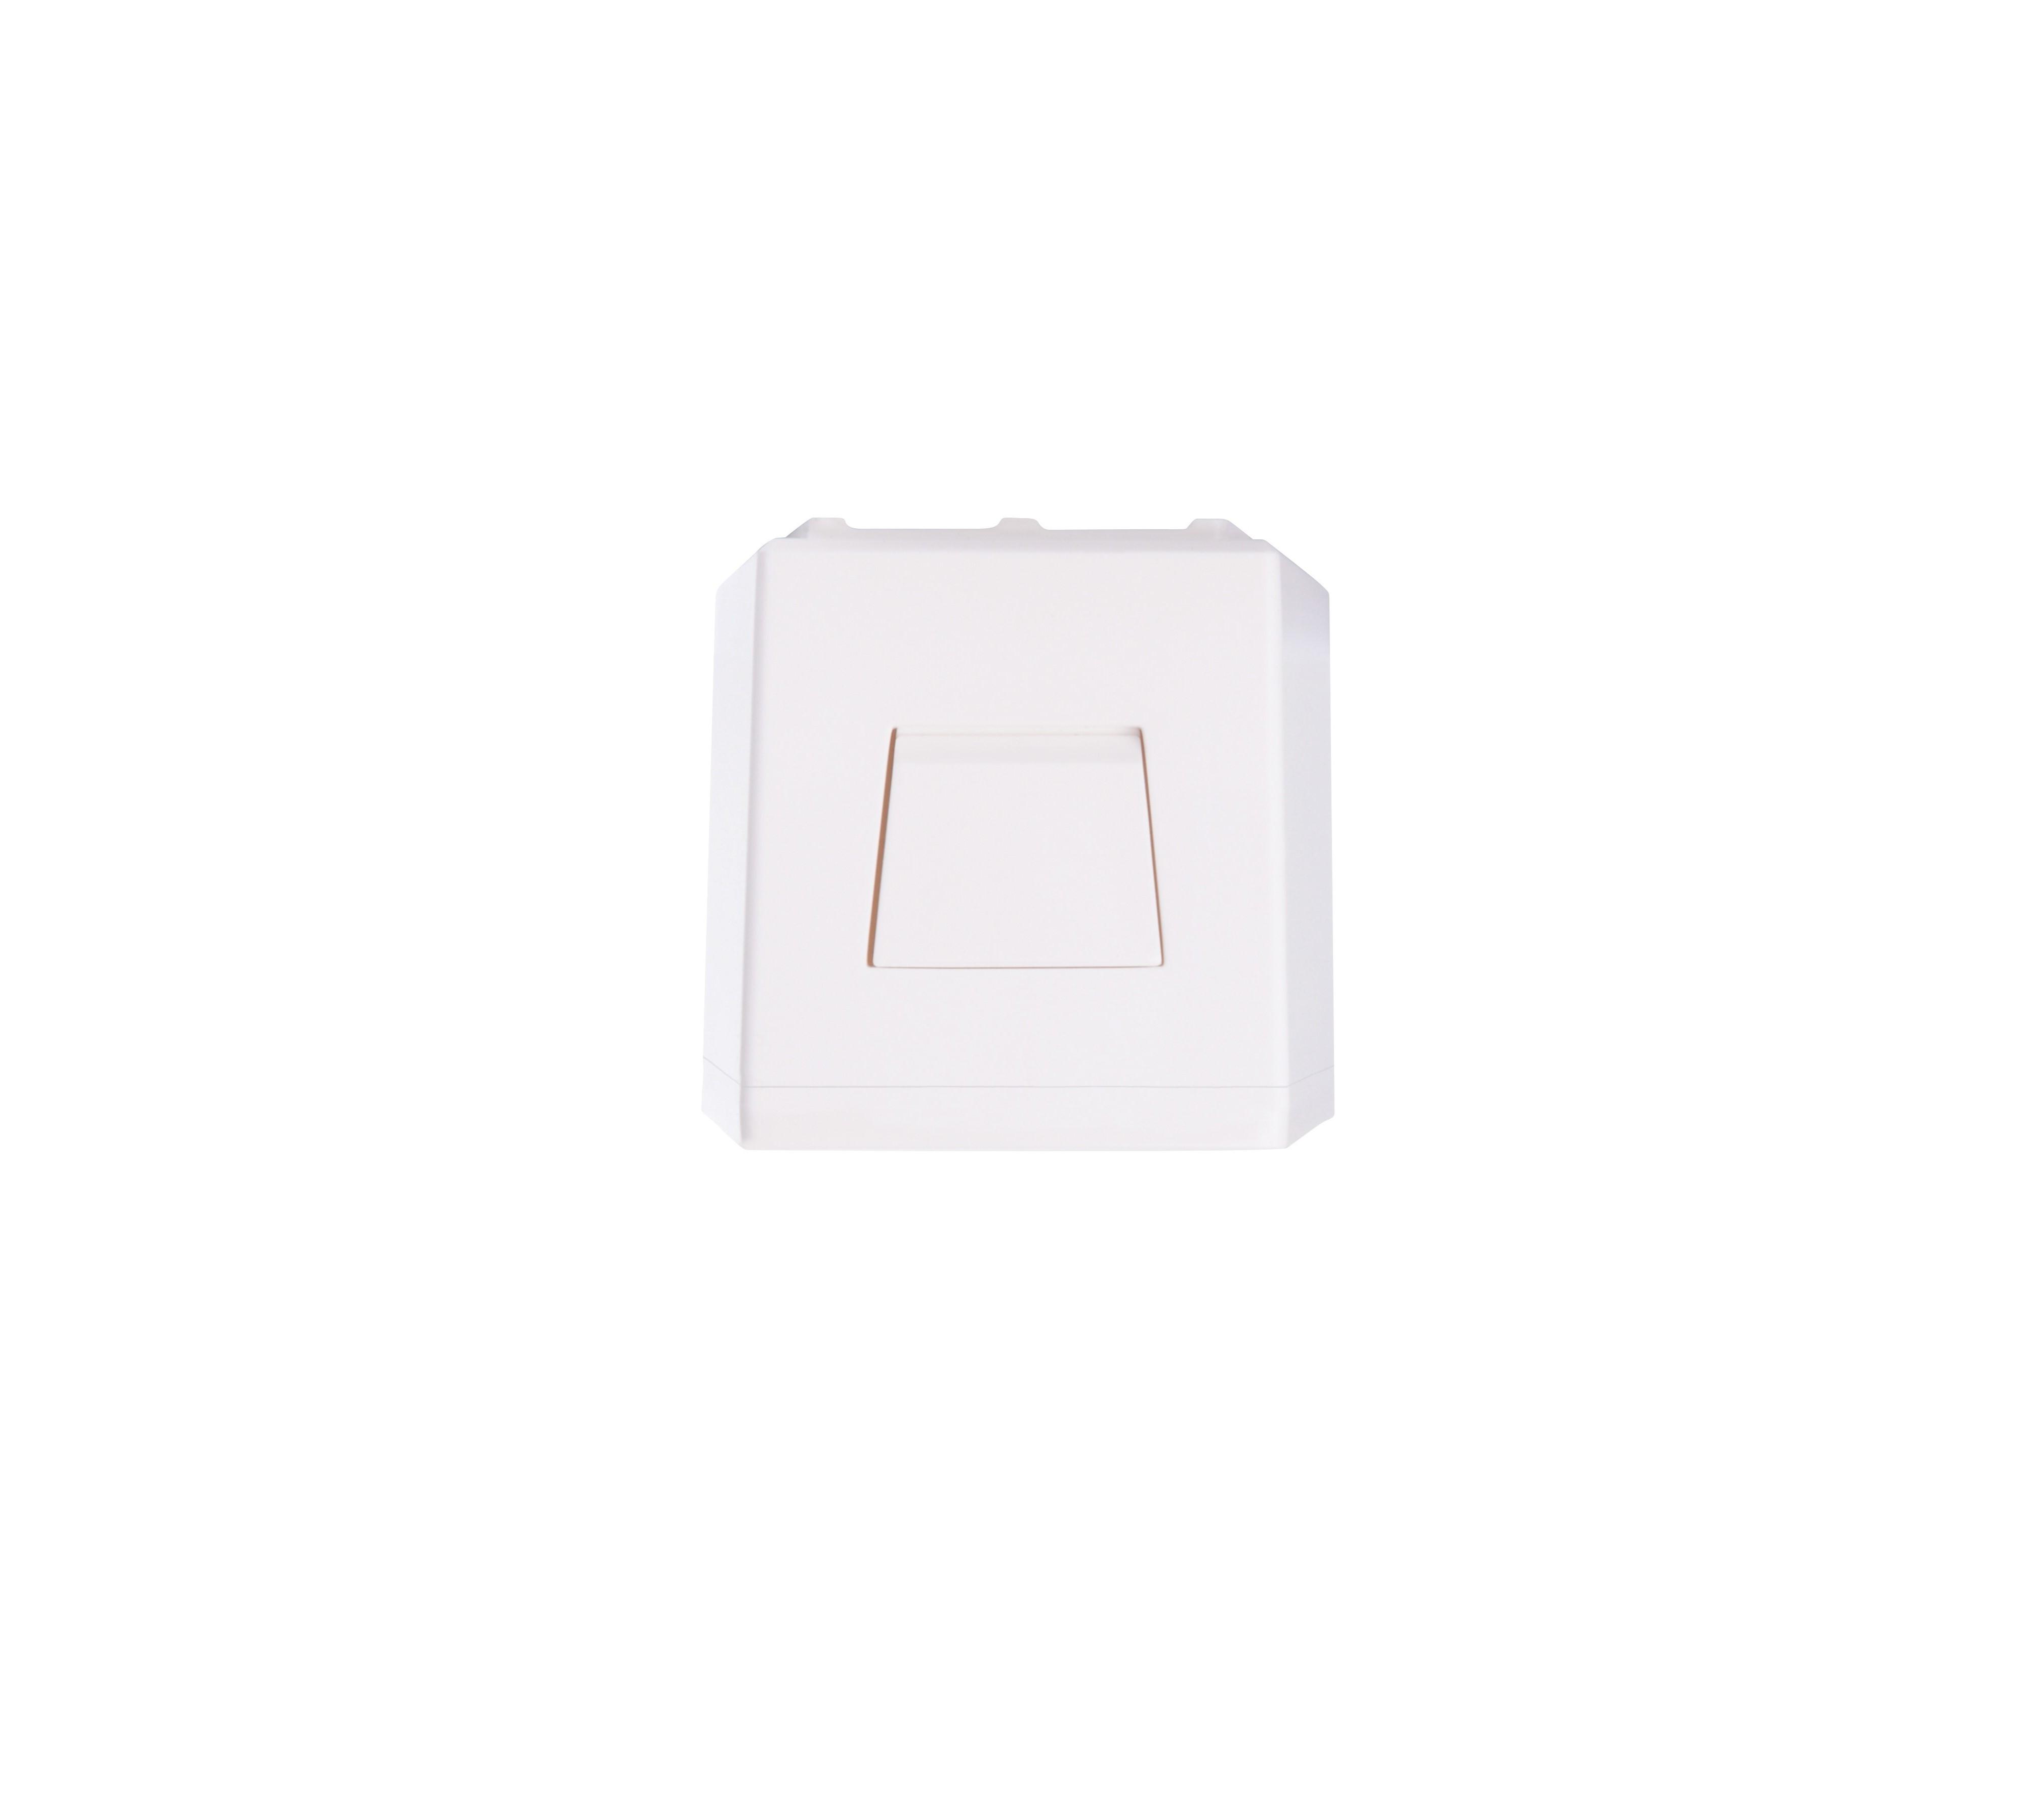 Lampa emergenta led Intelight 94771   2h nementinut test automat 1